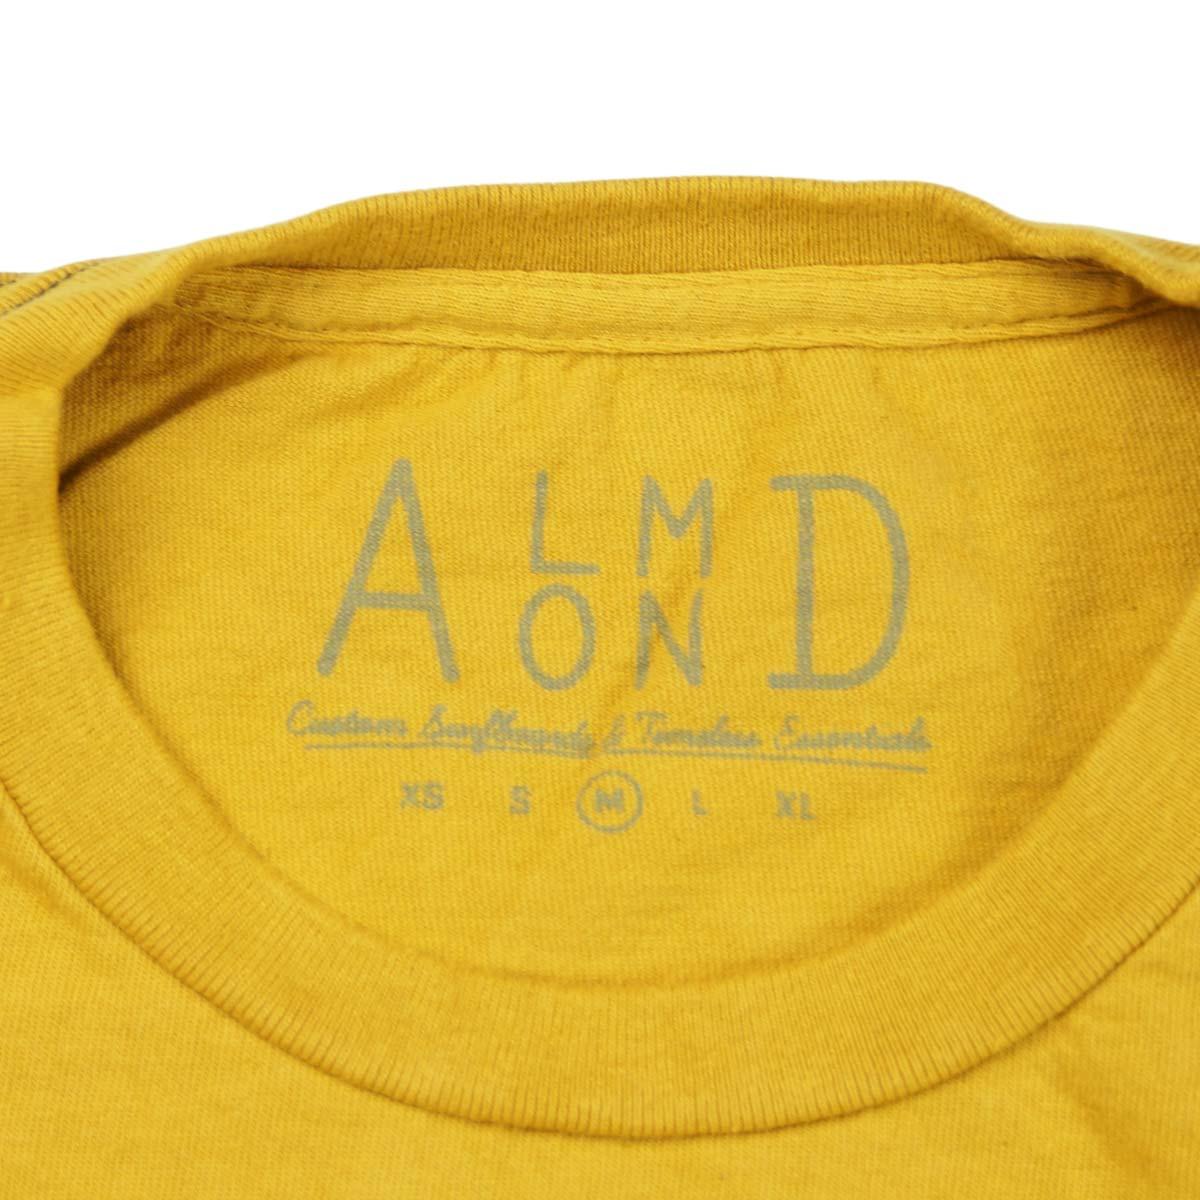 Almond Surf アーモンドサーフボードデザイン ESSENTIALS PK TEE